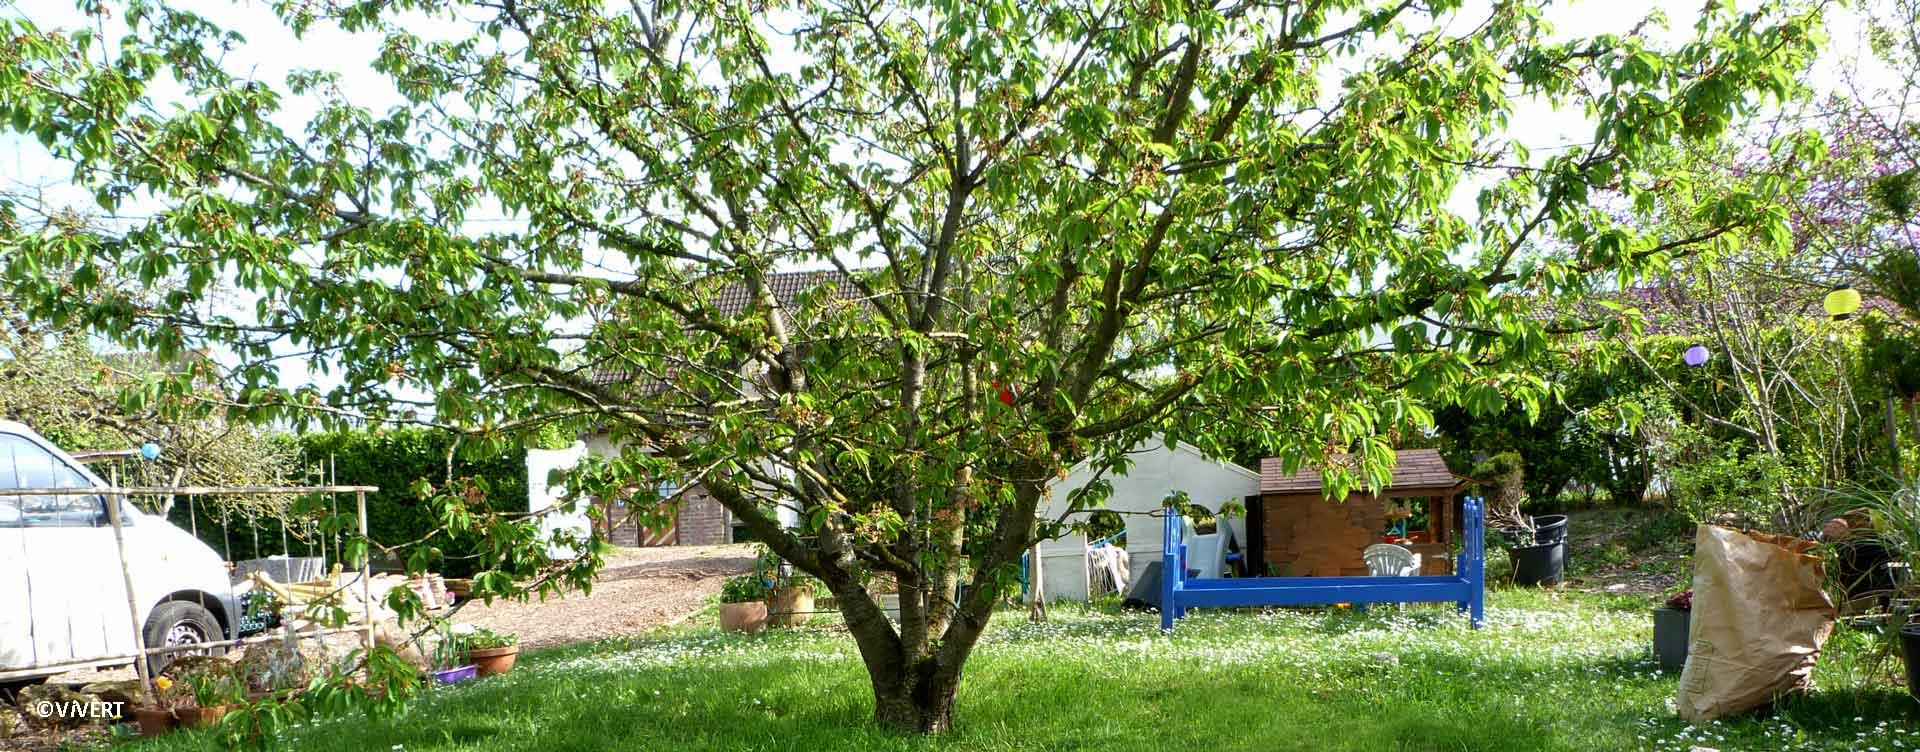 arbres-elagage-vivert